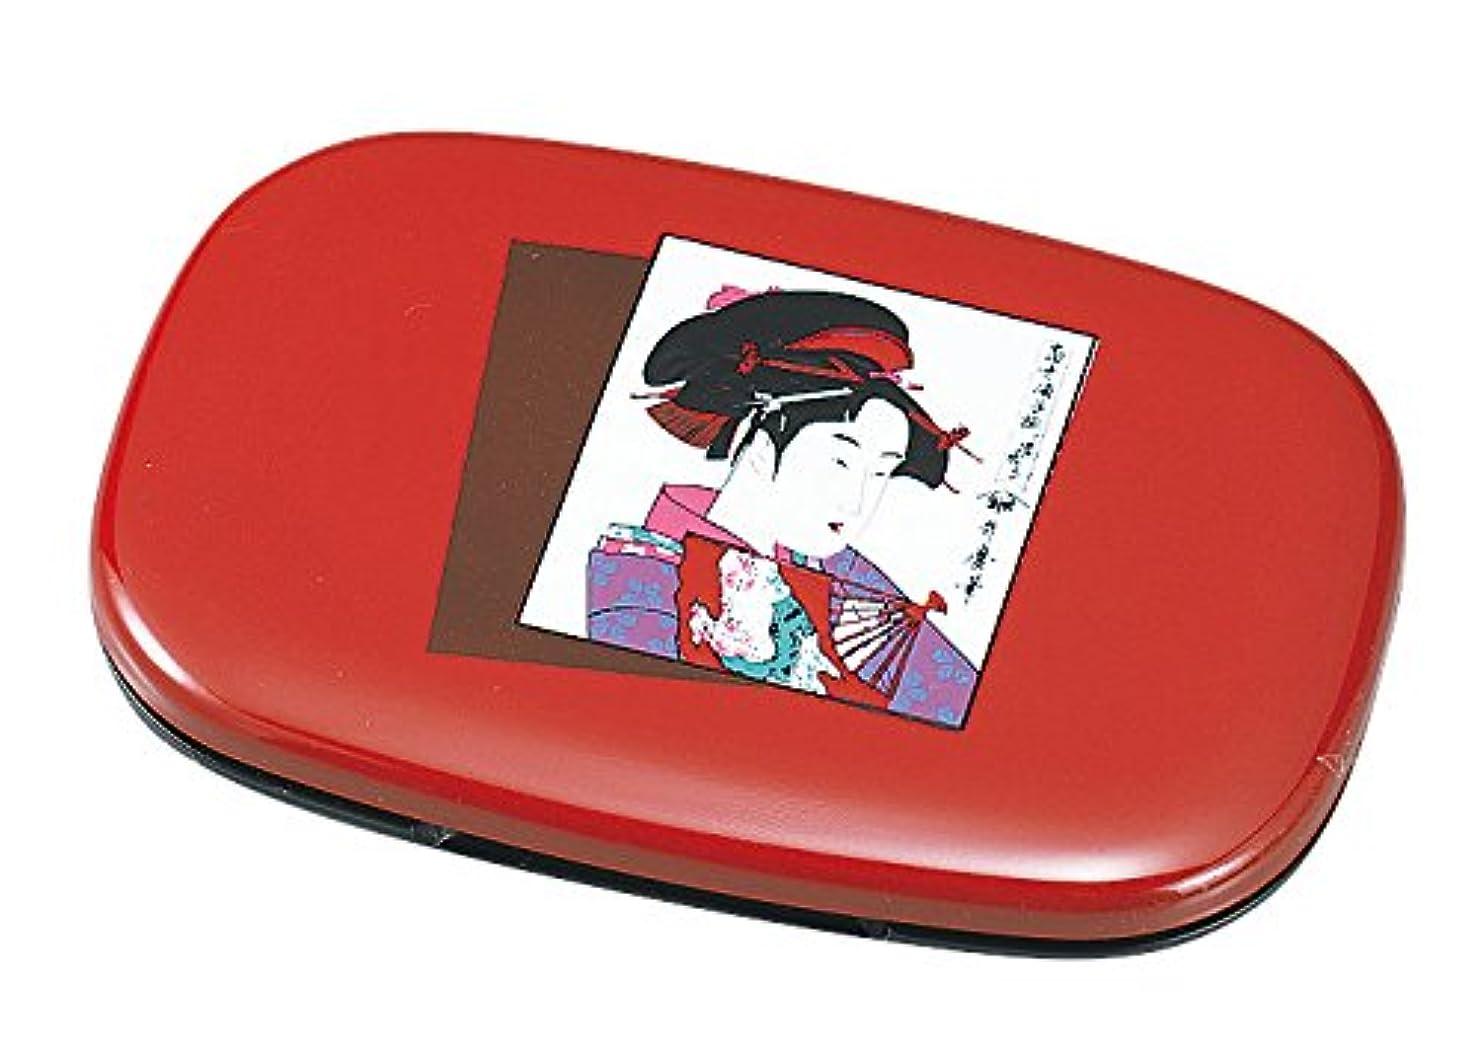 矢印構造的ピザ中谷兄弟商会 山中漆器 小判コンパクトミラー 朱黒 浮世絵